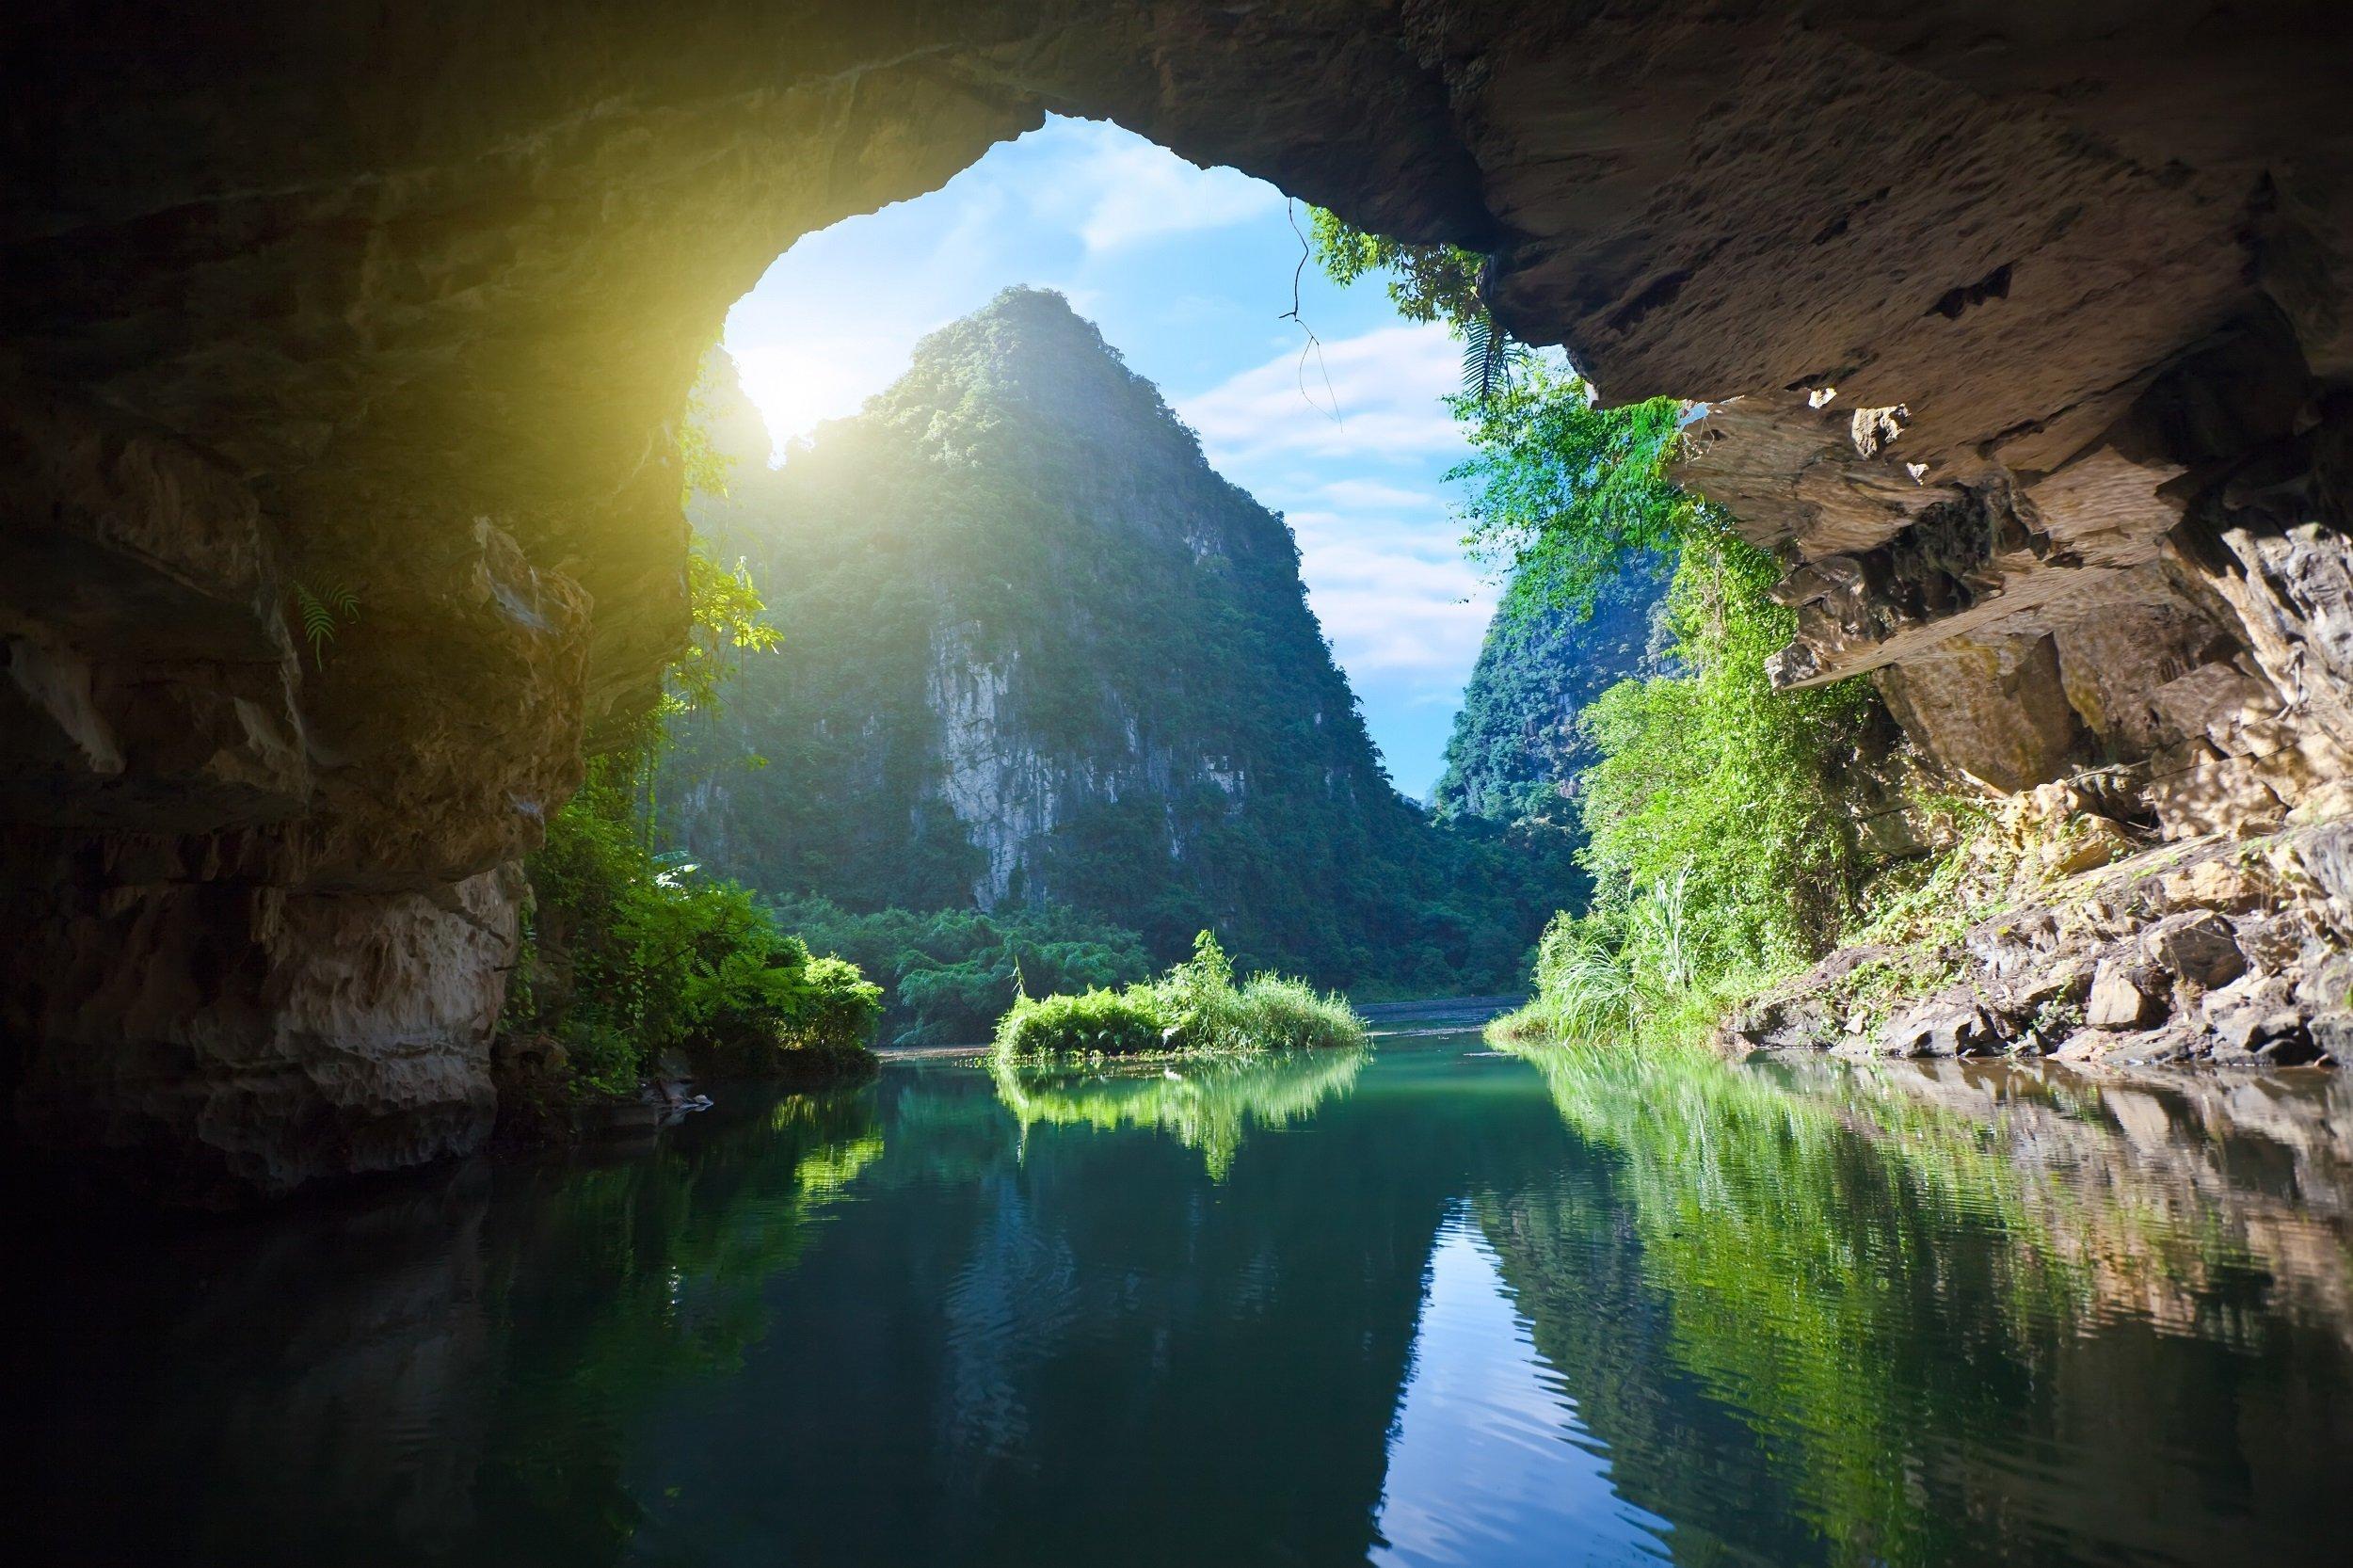 Explore The Unesco World Heritage Tam Coc On The Ninh Binh, Tam Coc, Dancing Cave & Hoa Lu Tour From Hanoi